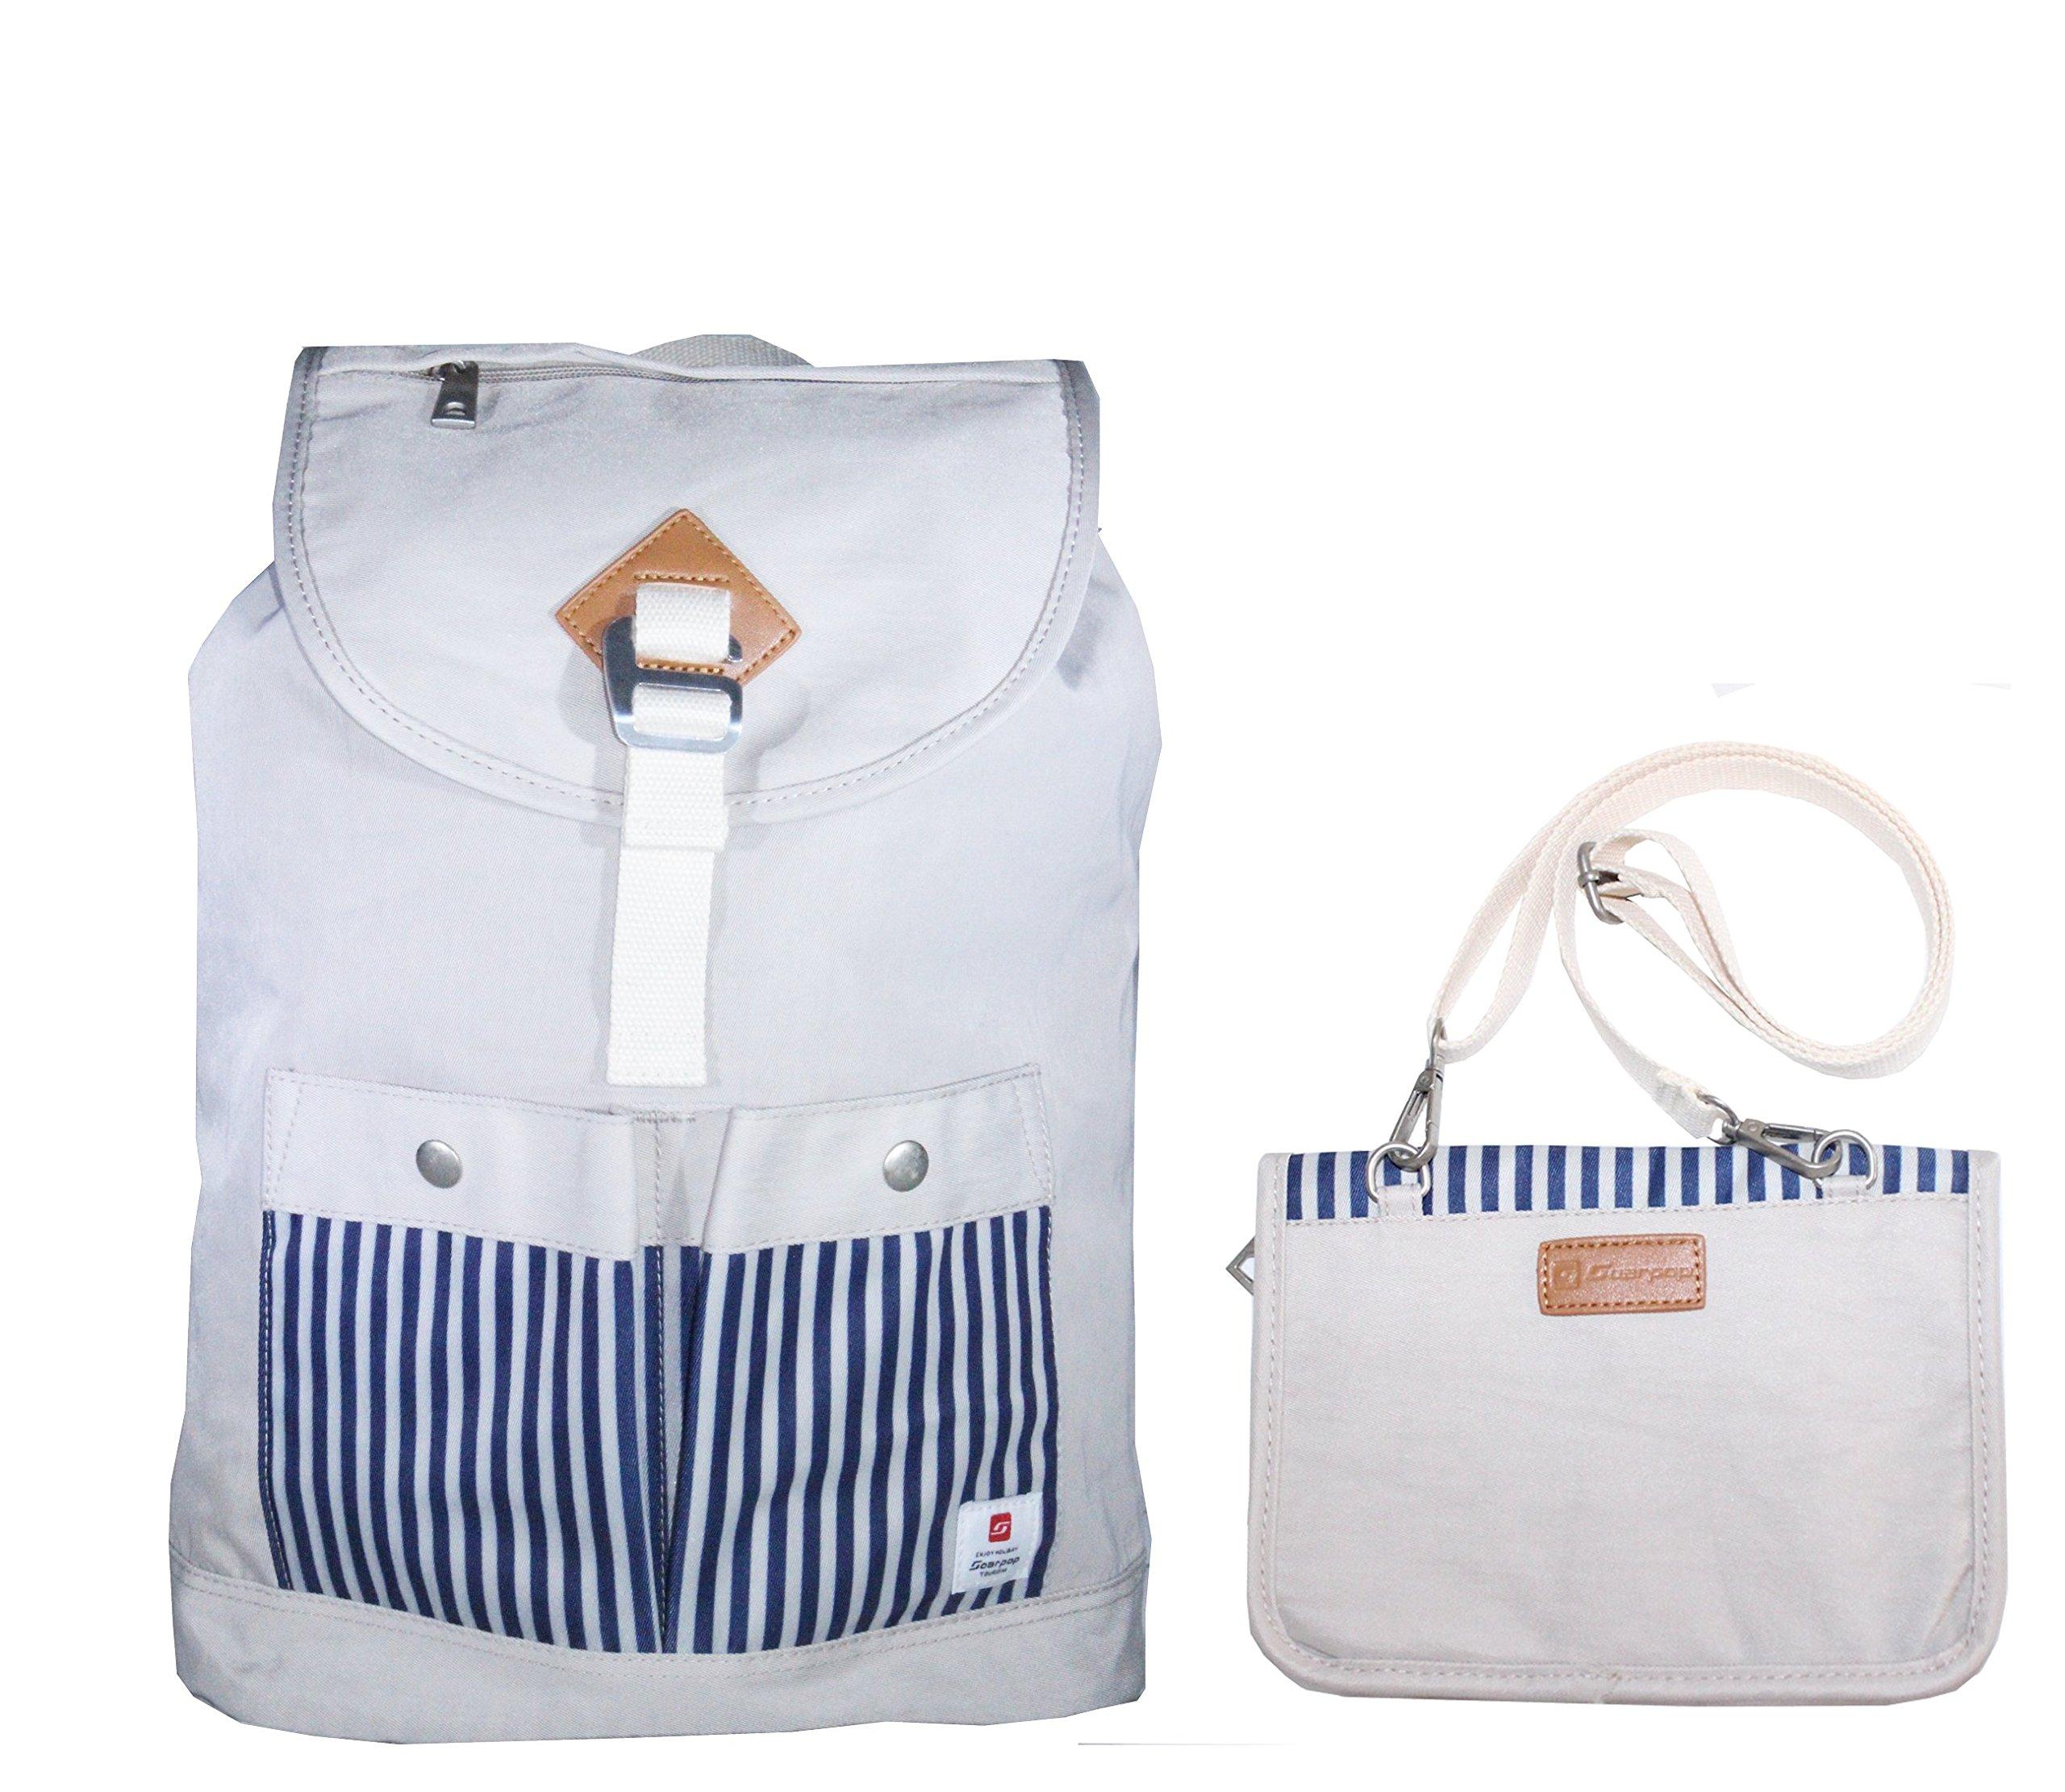 Avilana School Backpack Lightweight Travel Backpack | Laptop Backpack | Roomy, Multi-Functional, and Water-Resistant Drawstring Backpack by (Beige)